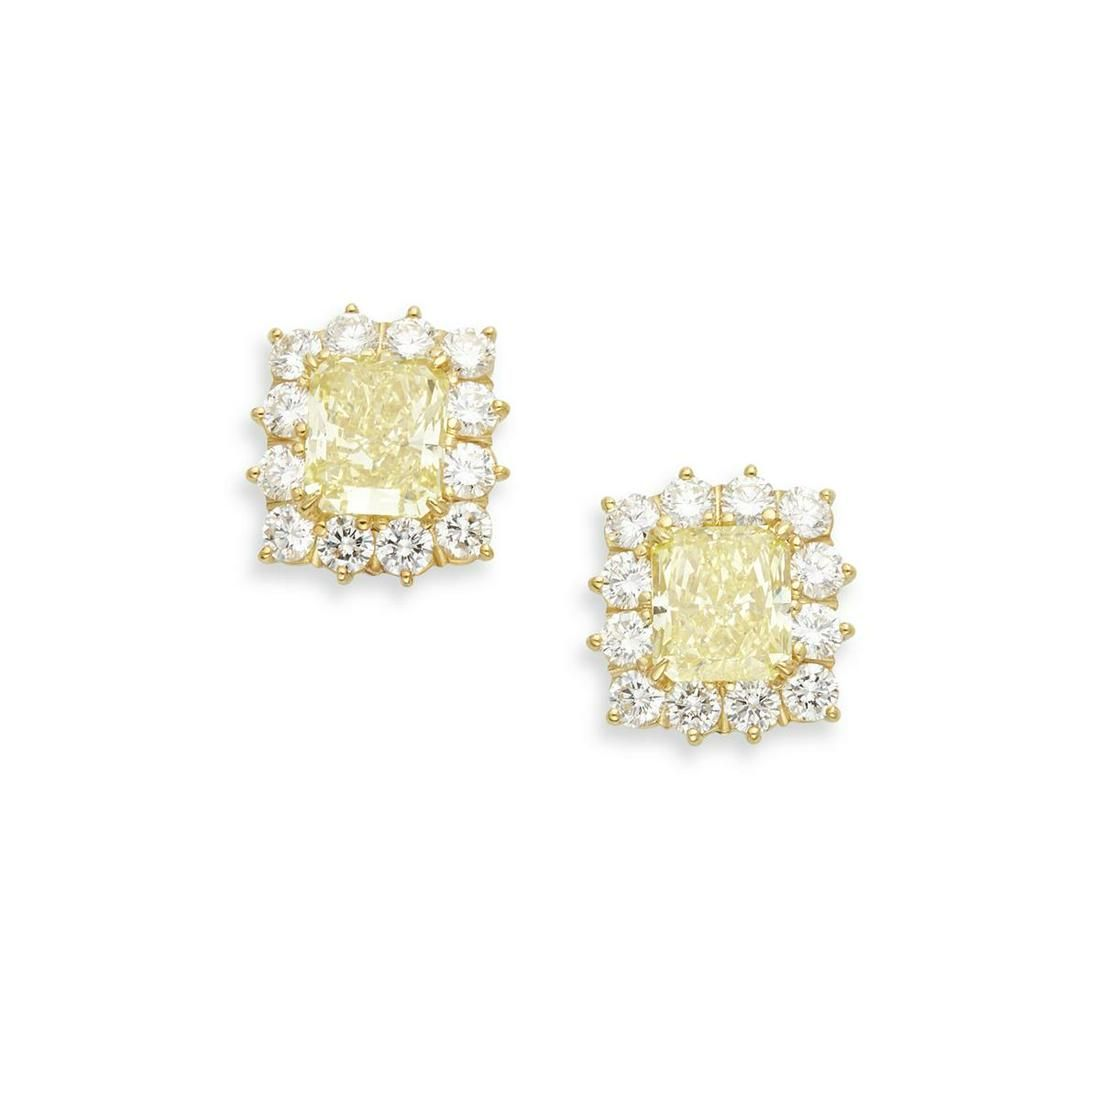 Pair of Fancy Yellow diamond & 18K gold ear studs